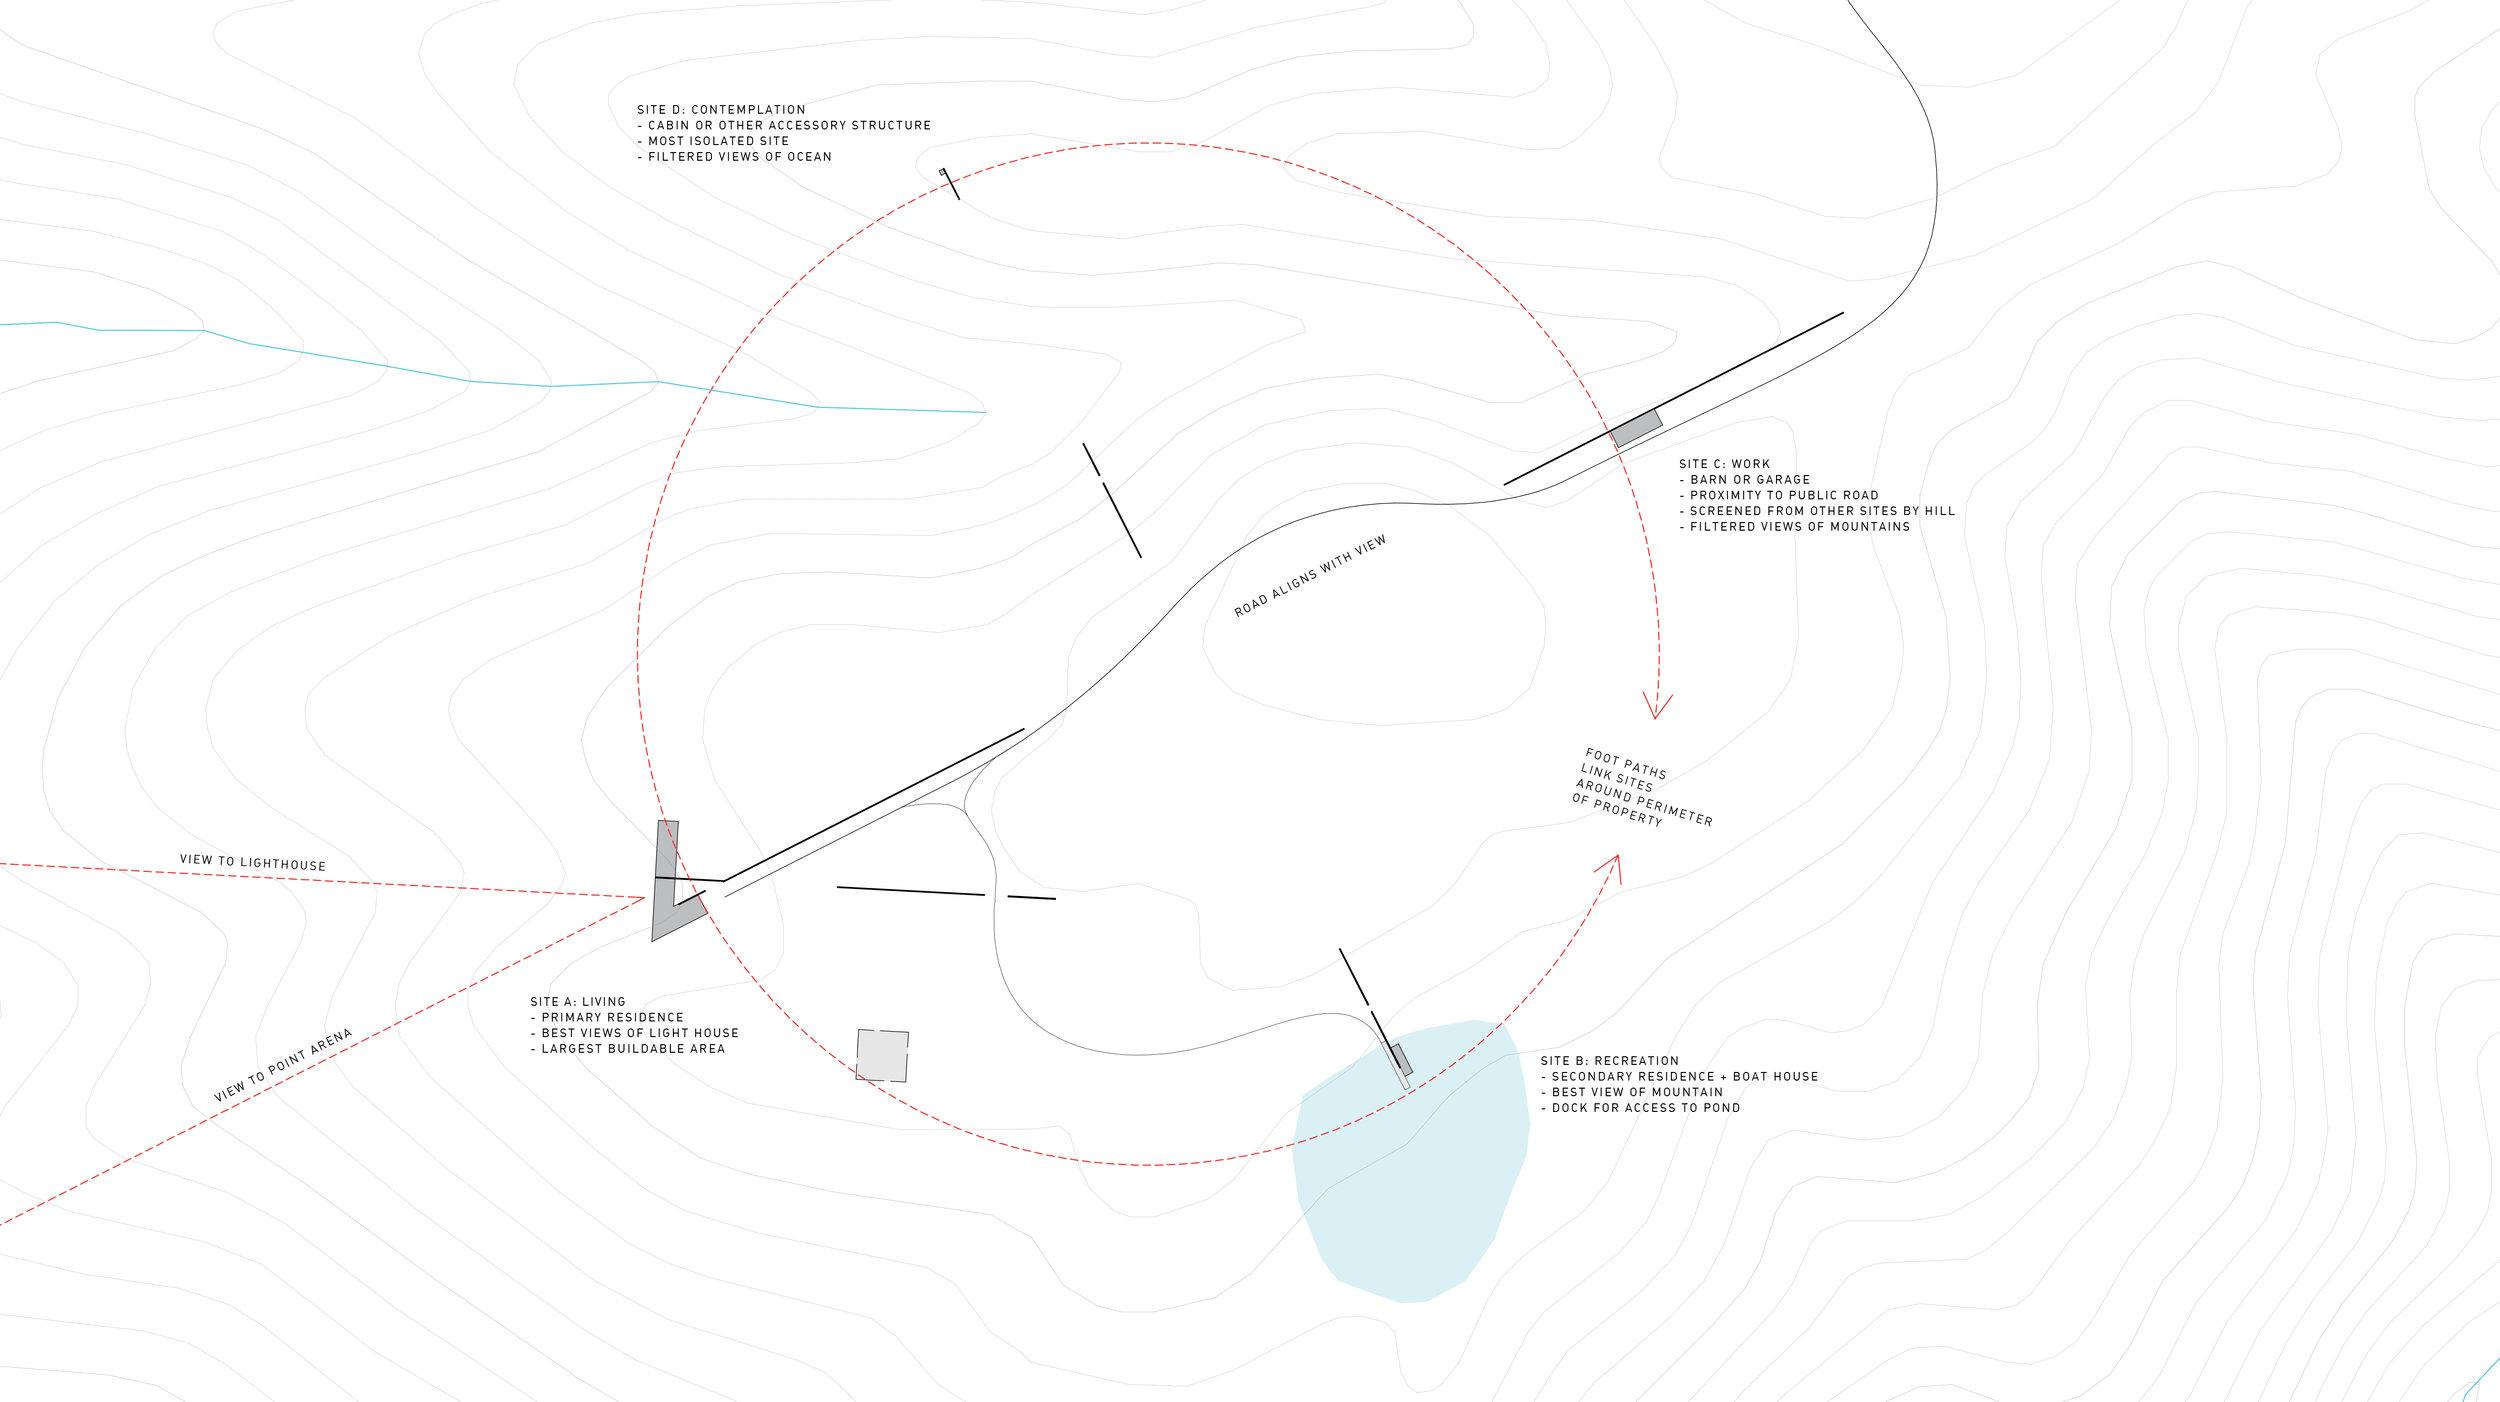 5.0 1701 Site Plan.JPG